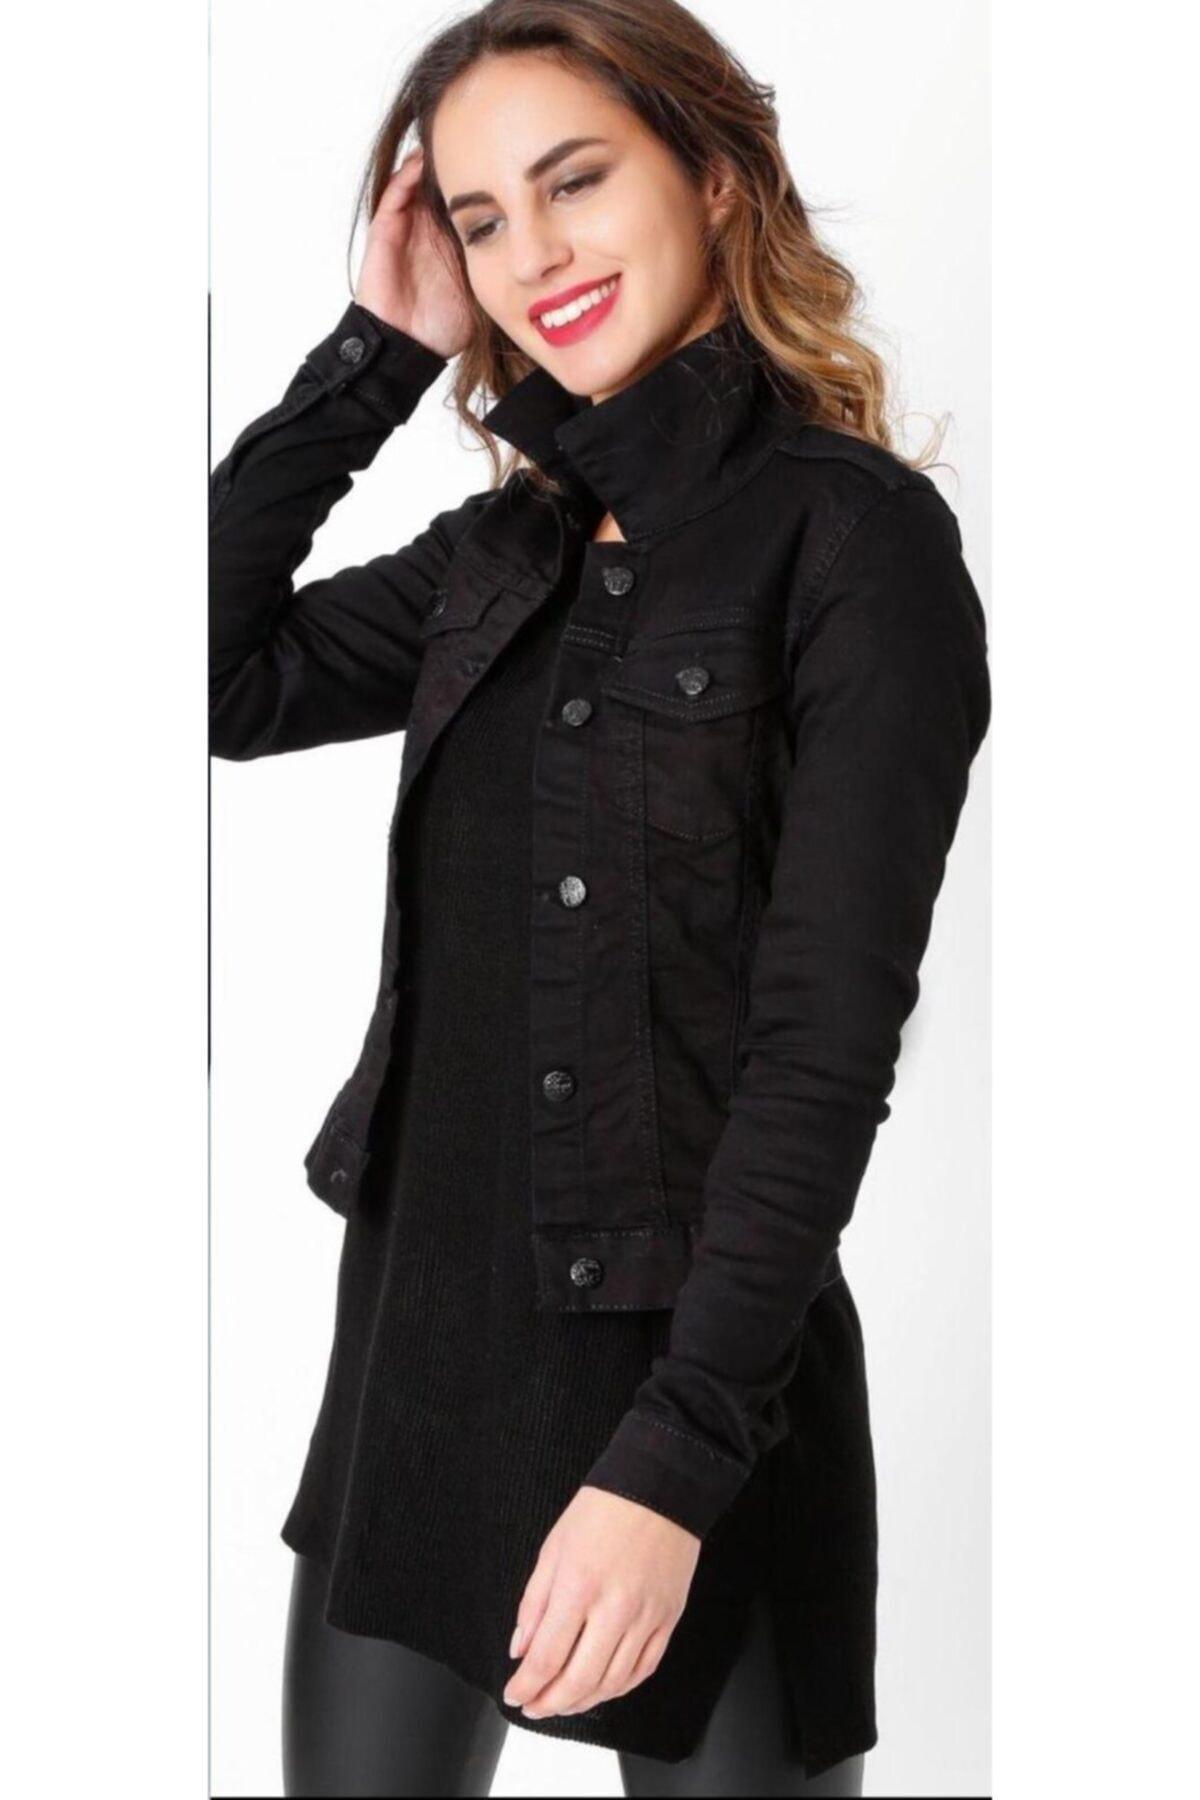 Campus Kadın Siyah Kısa Kot Ceket 1